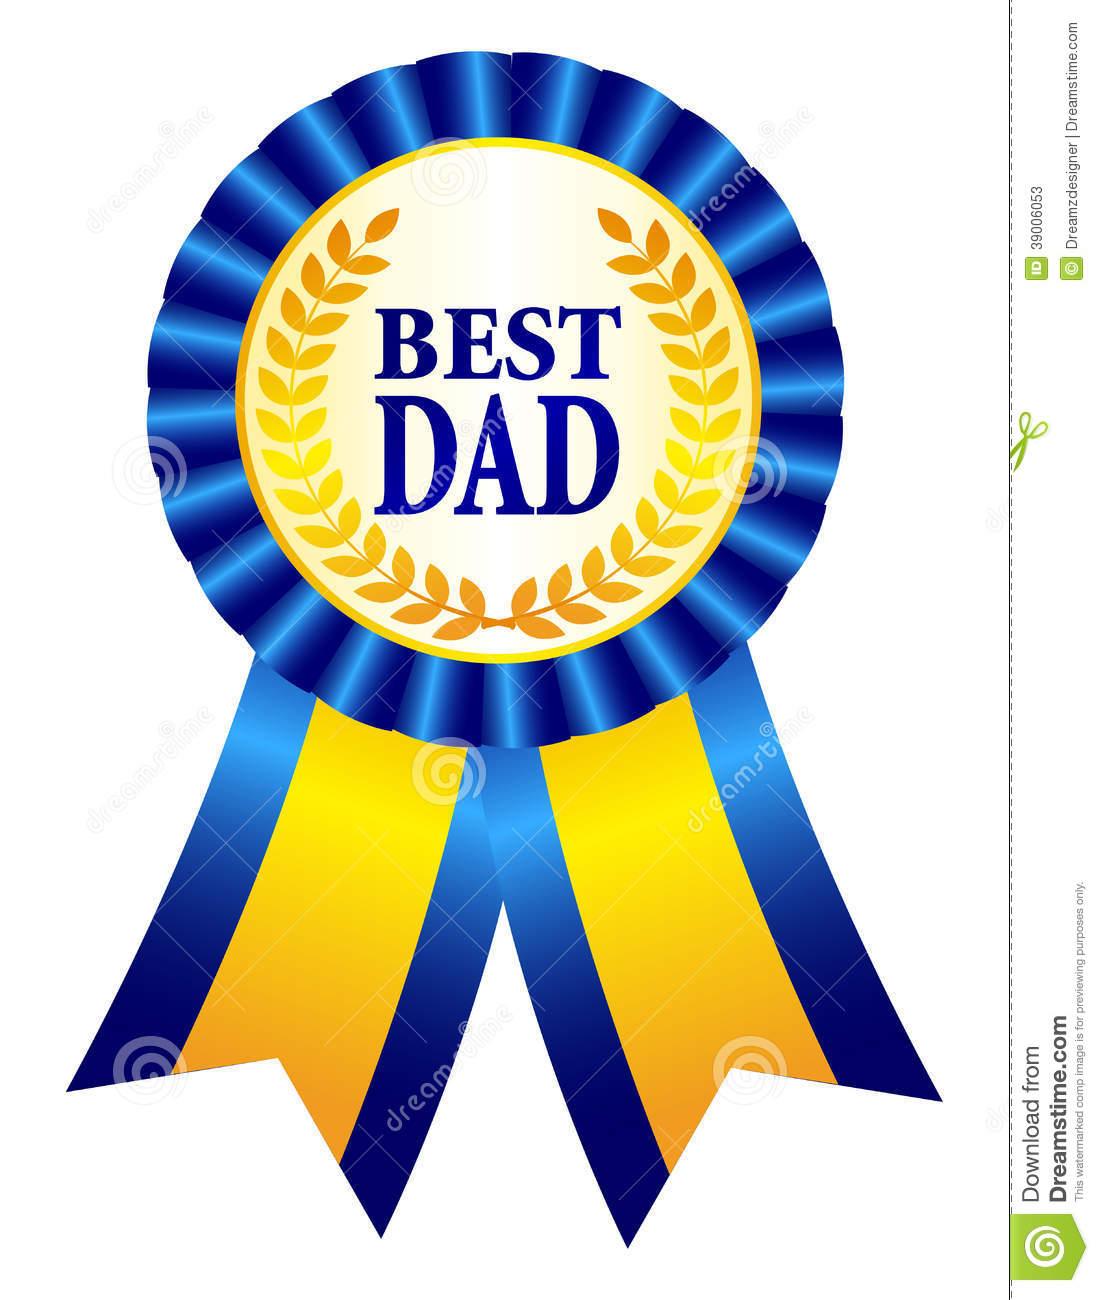 1 Dad Clipart.